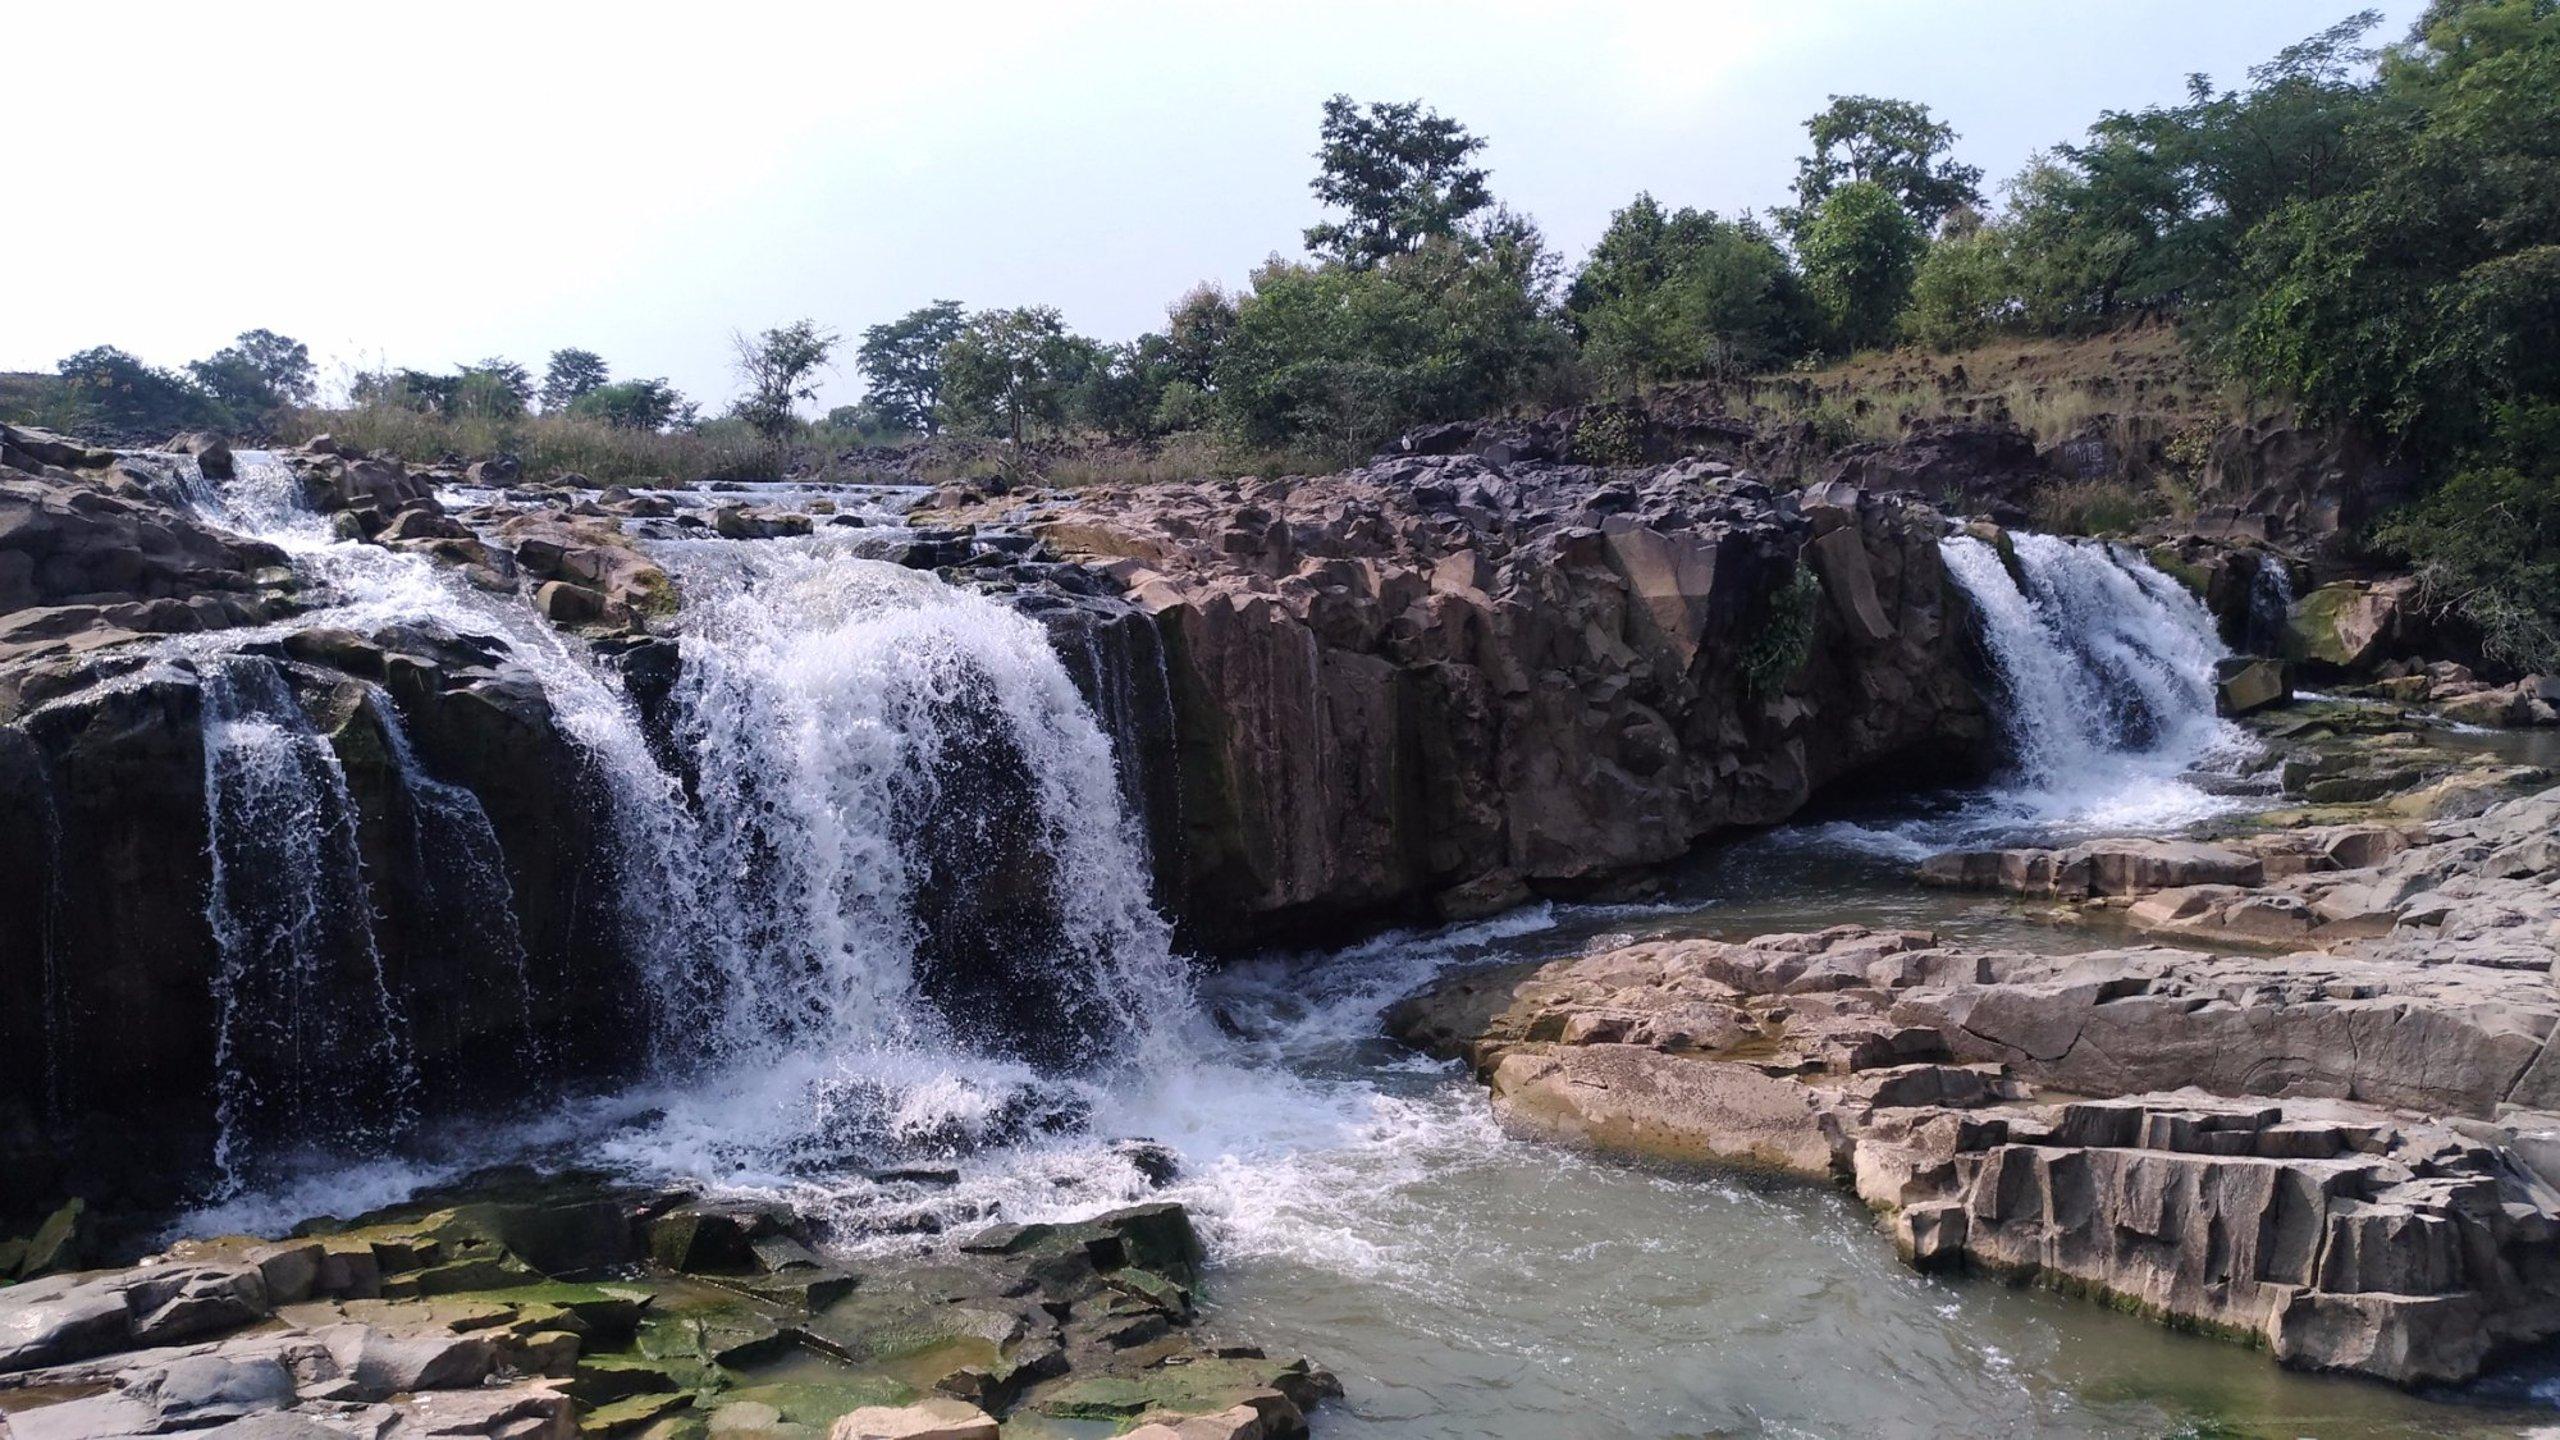 Visit Pochera Waterfalls - The Deepest Waterfall in Telangana